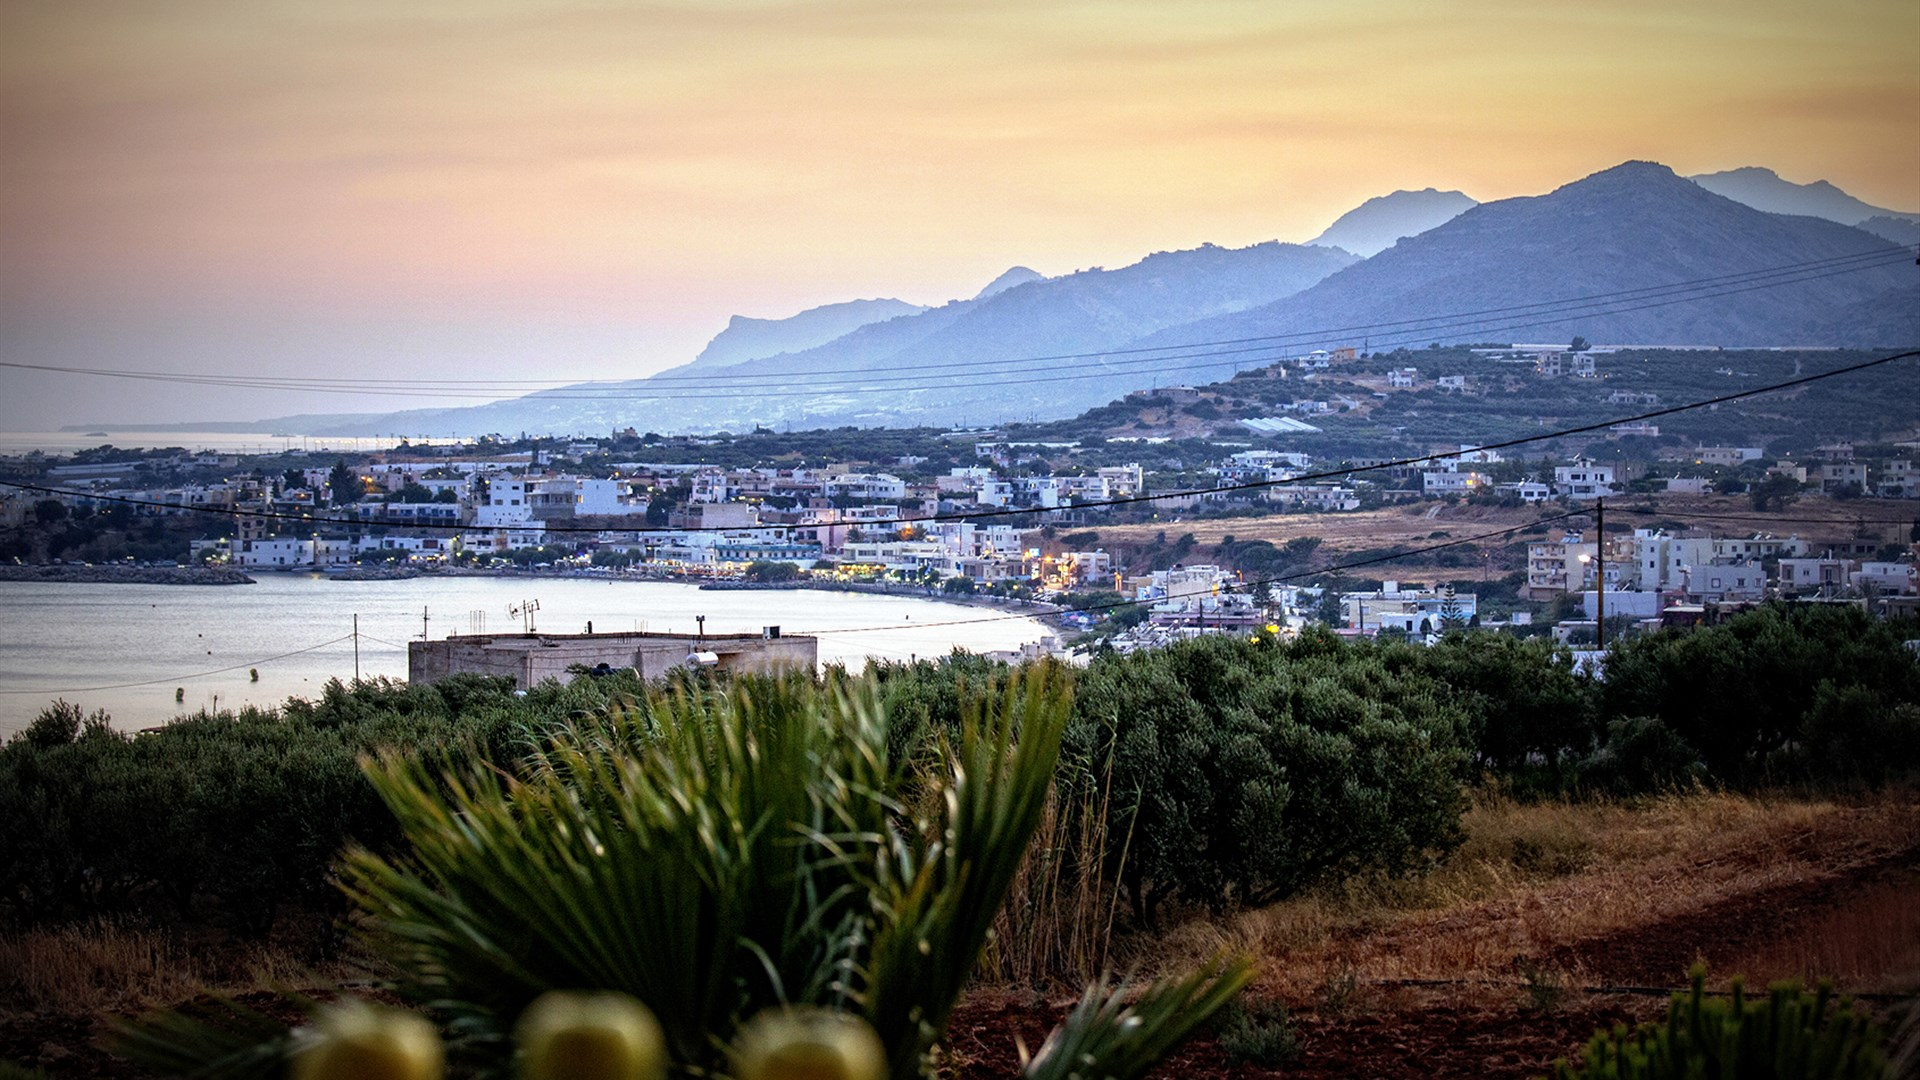 Makry Gialos - Ierapetra Crete | 12 Jun 2015 | Alargo